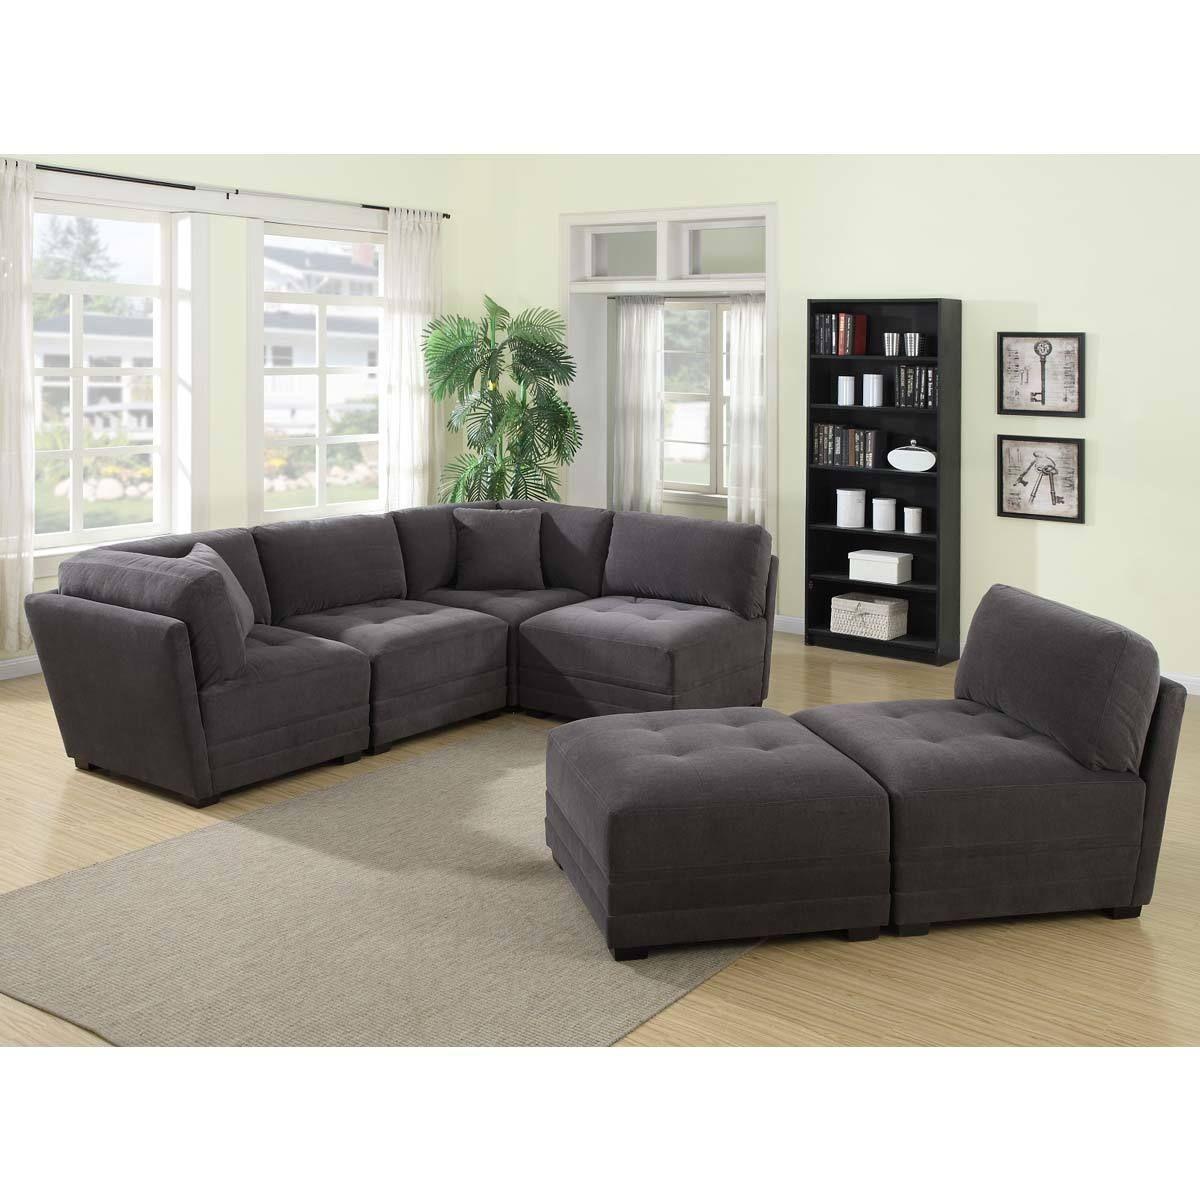 Mstar International Ethan 6 Piece Modular Fabric Sofa Sofa